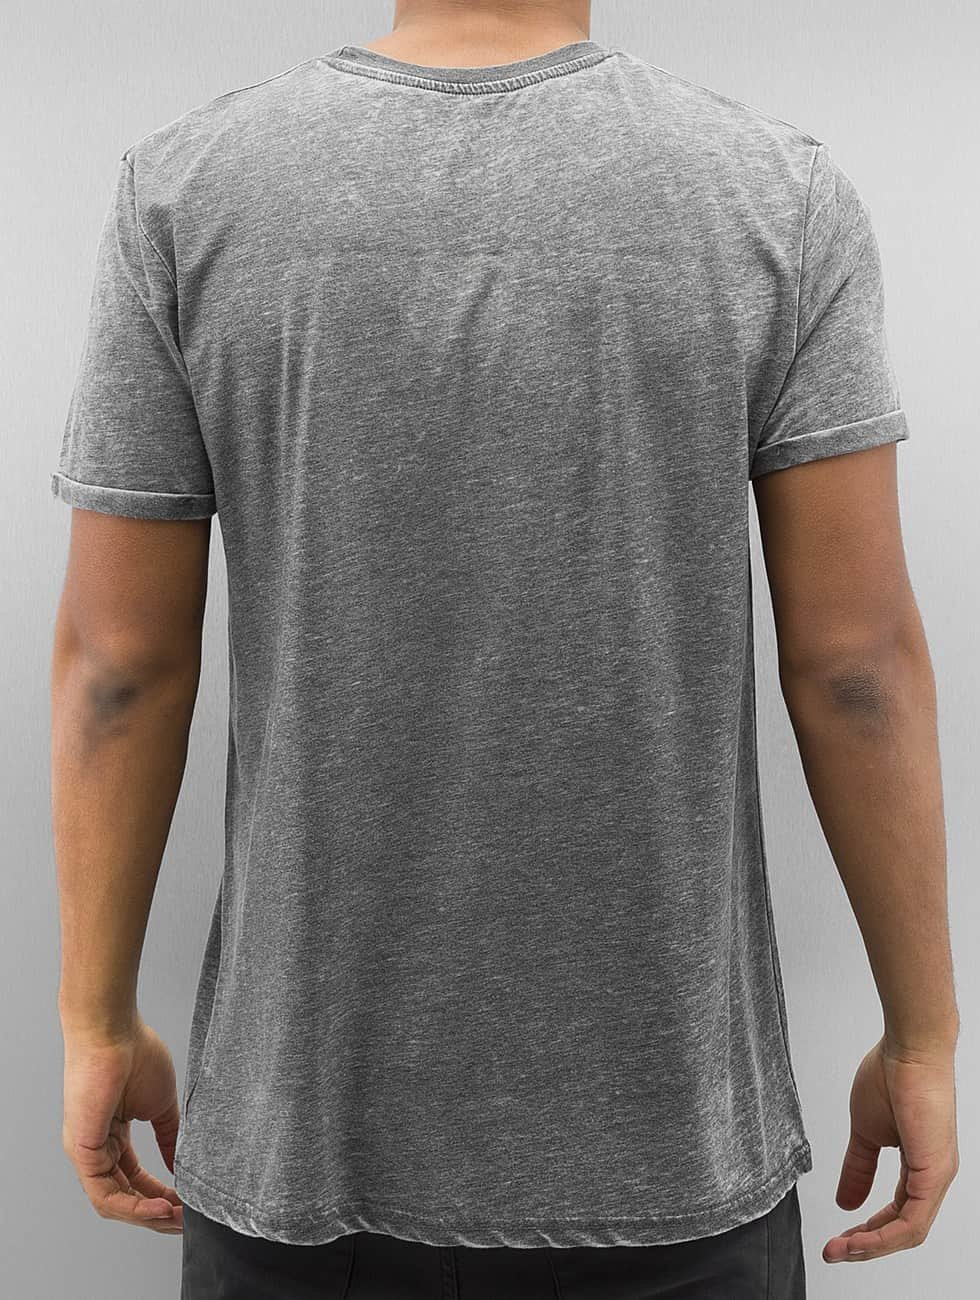 Monkey Business t-shirt Limited Edition grijs